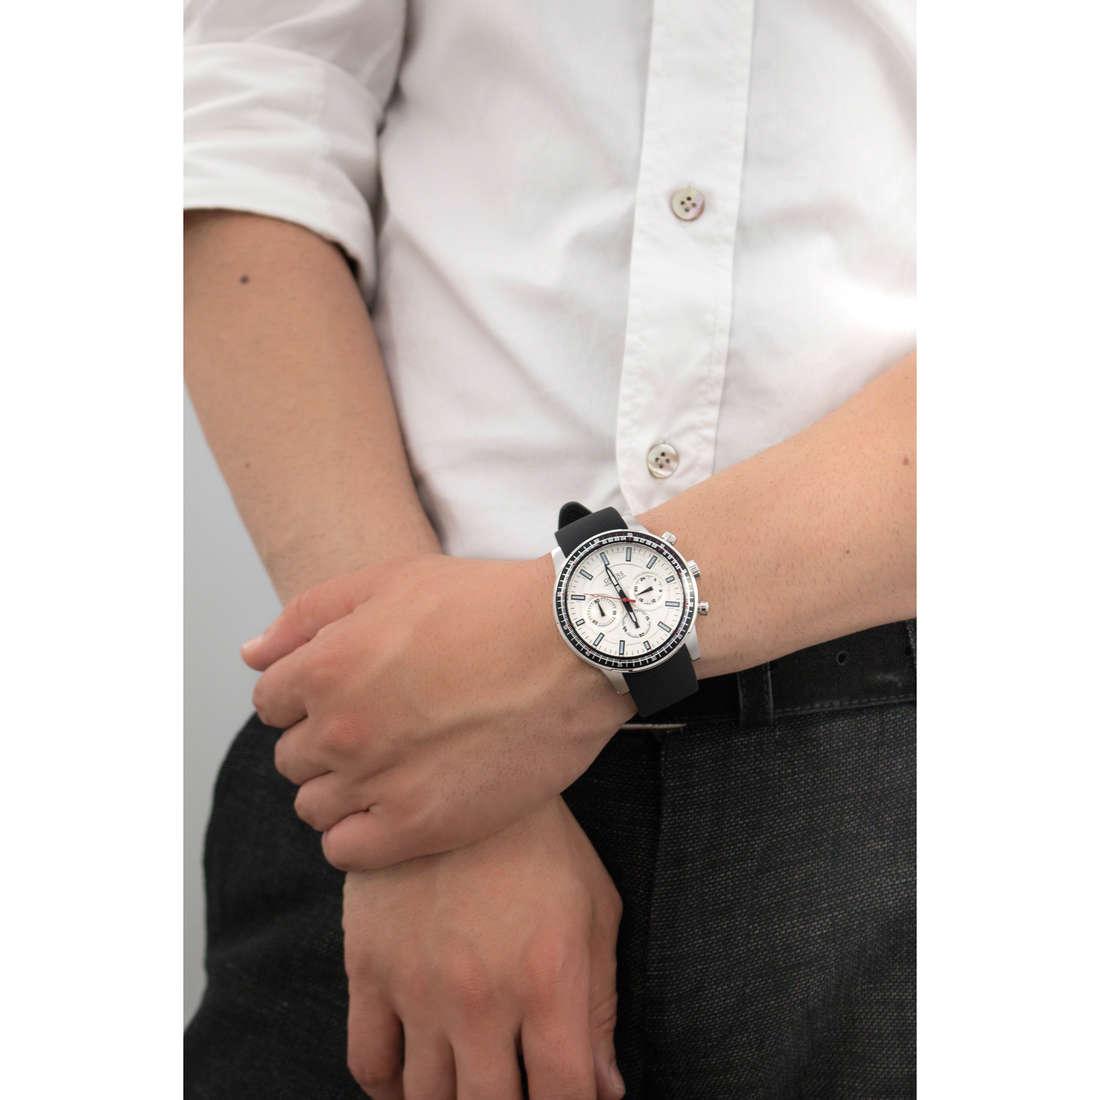 Guess cronografi uomo W0802G1 indosso